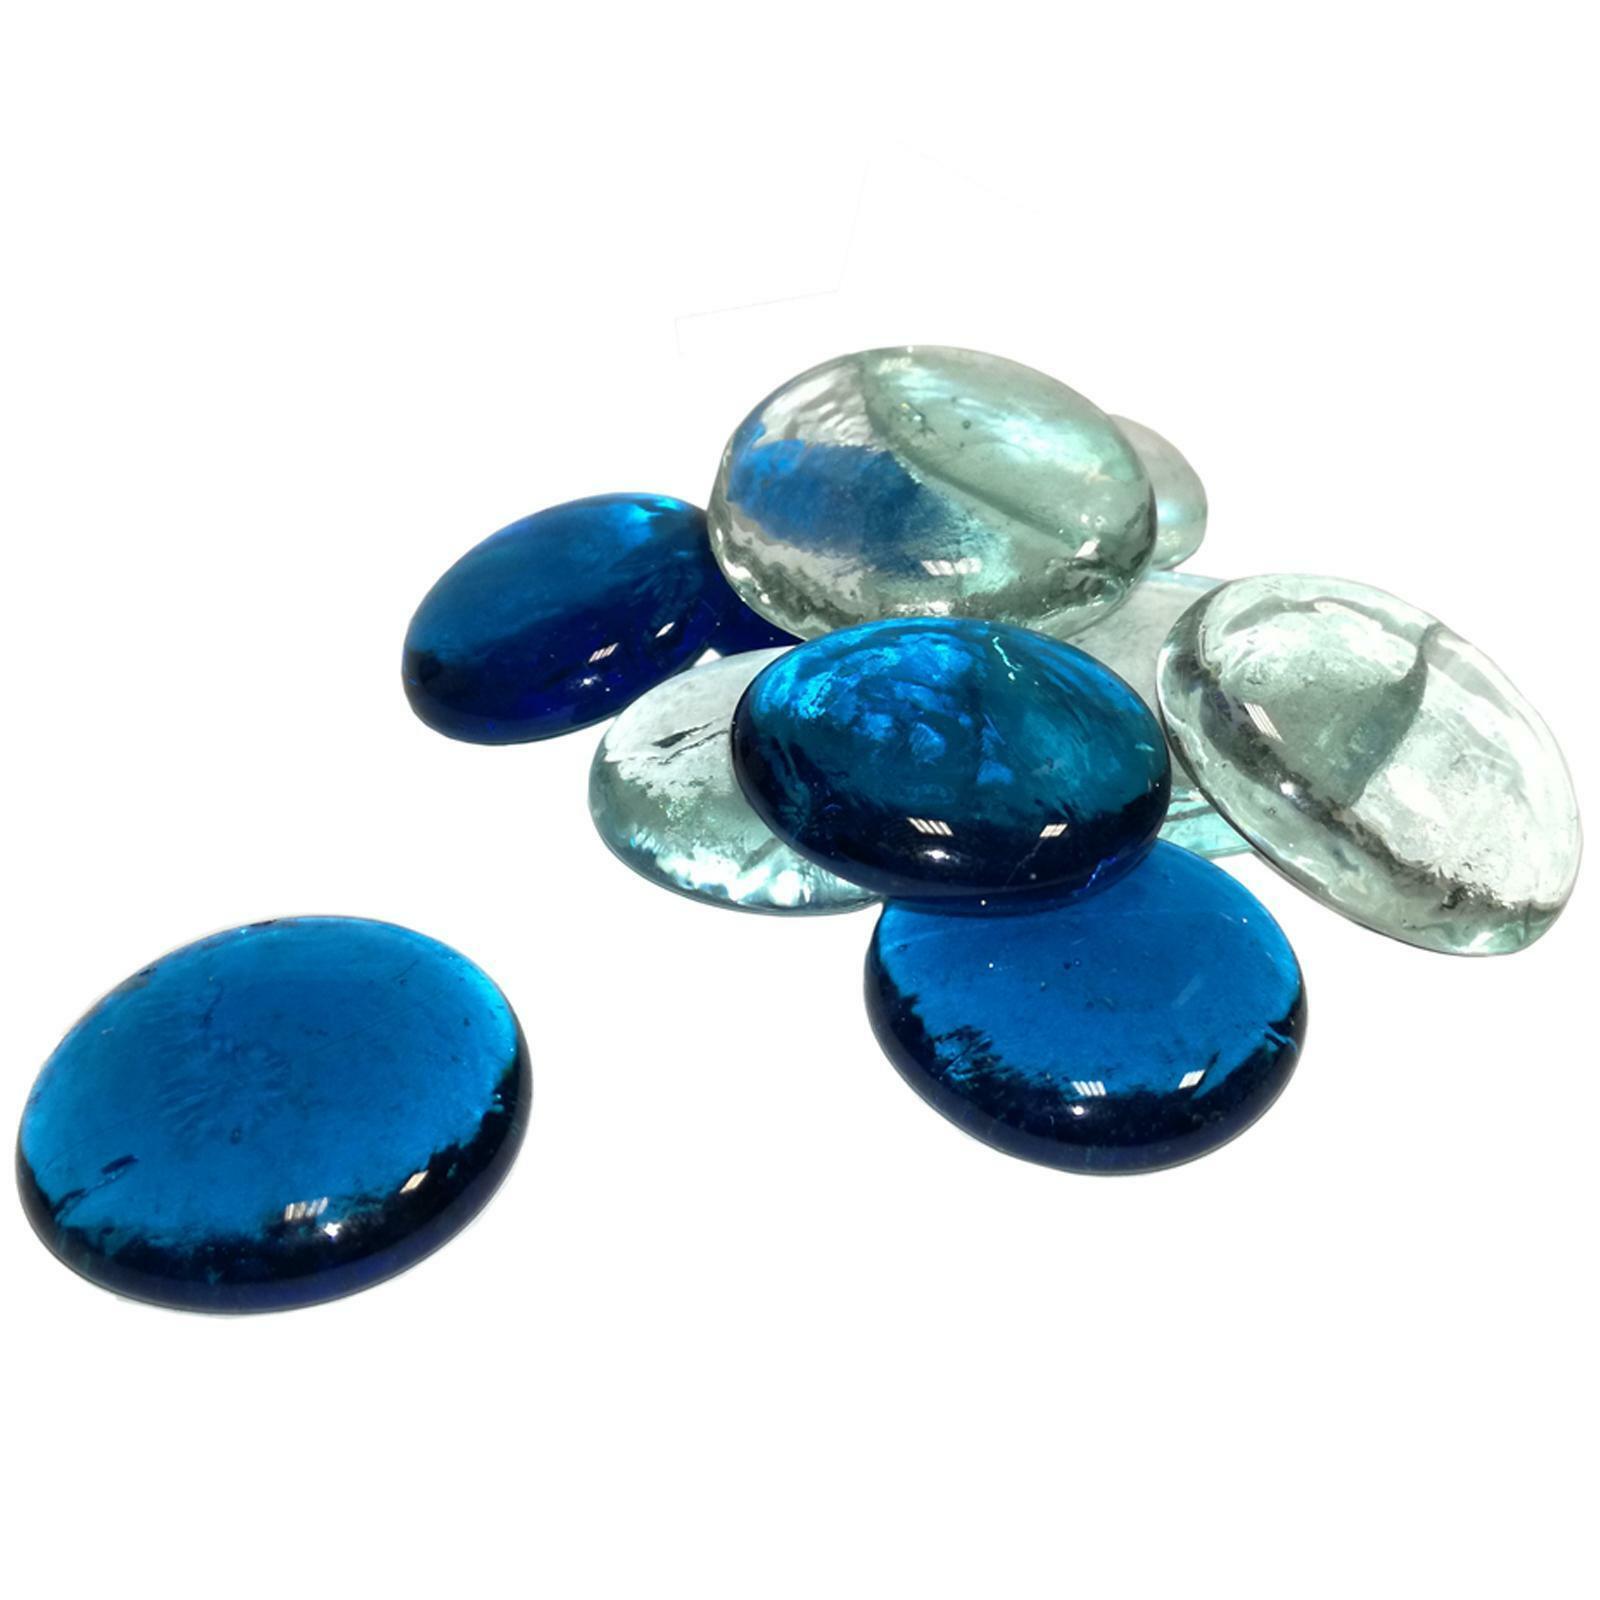 eurosand ciottoli decorativi in vetro mix trasparente/ blu 30 mm (100ml)